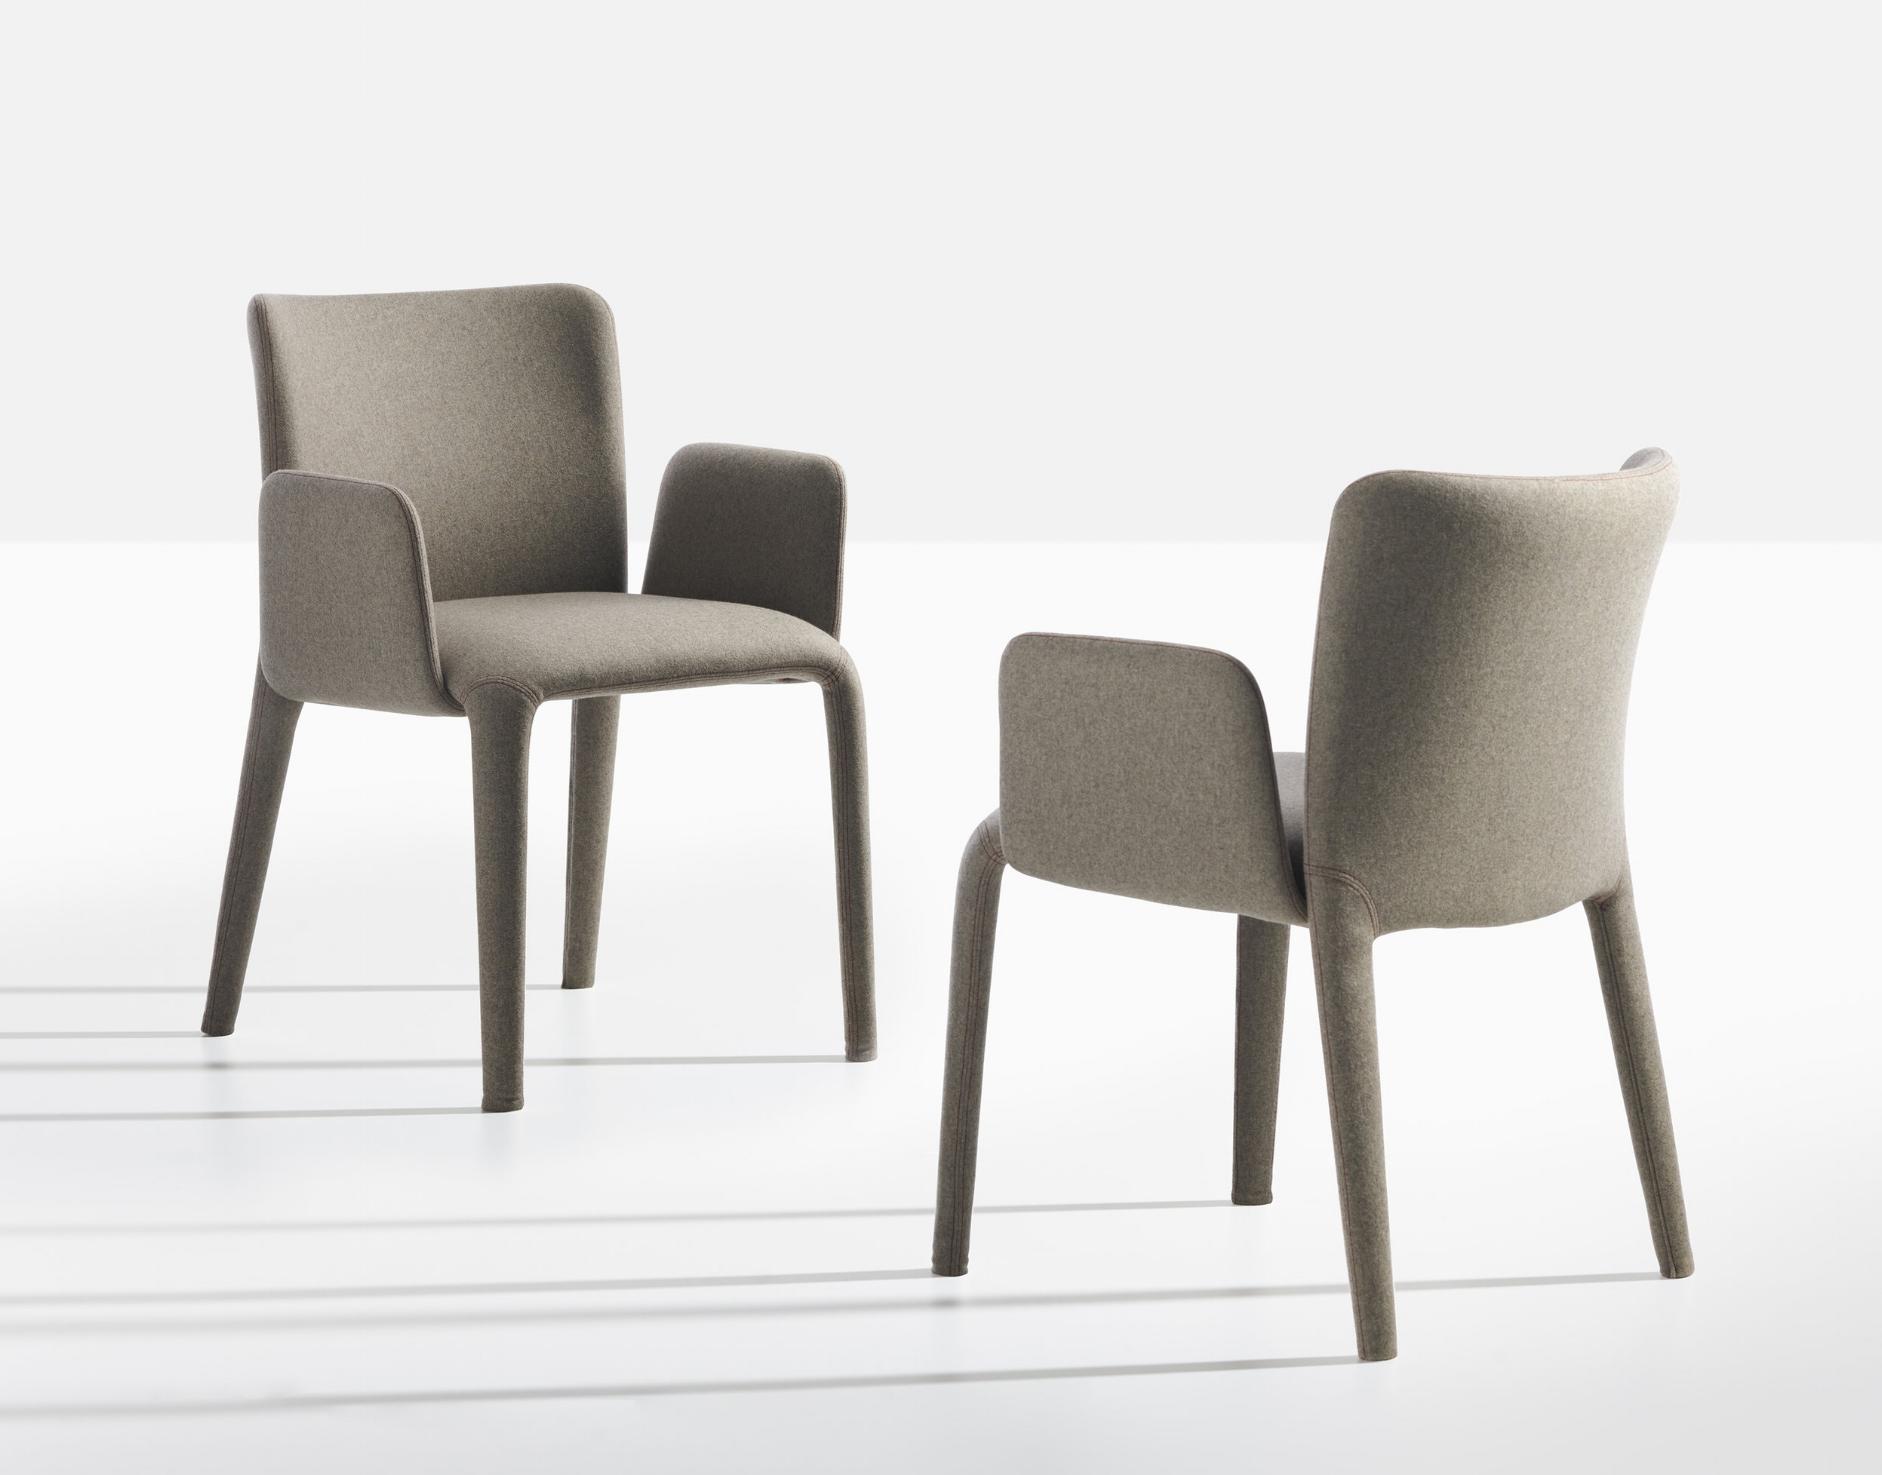 Potocco-LARS-armchair-Gabriele e Oscar Buratti.jpg